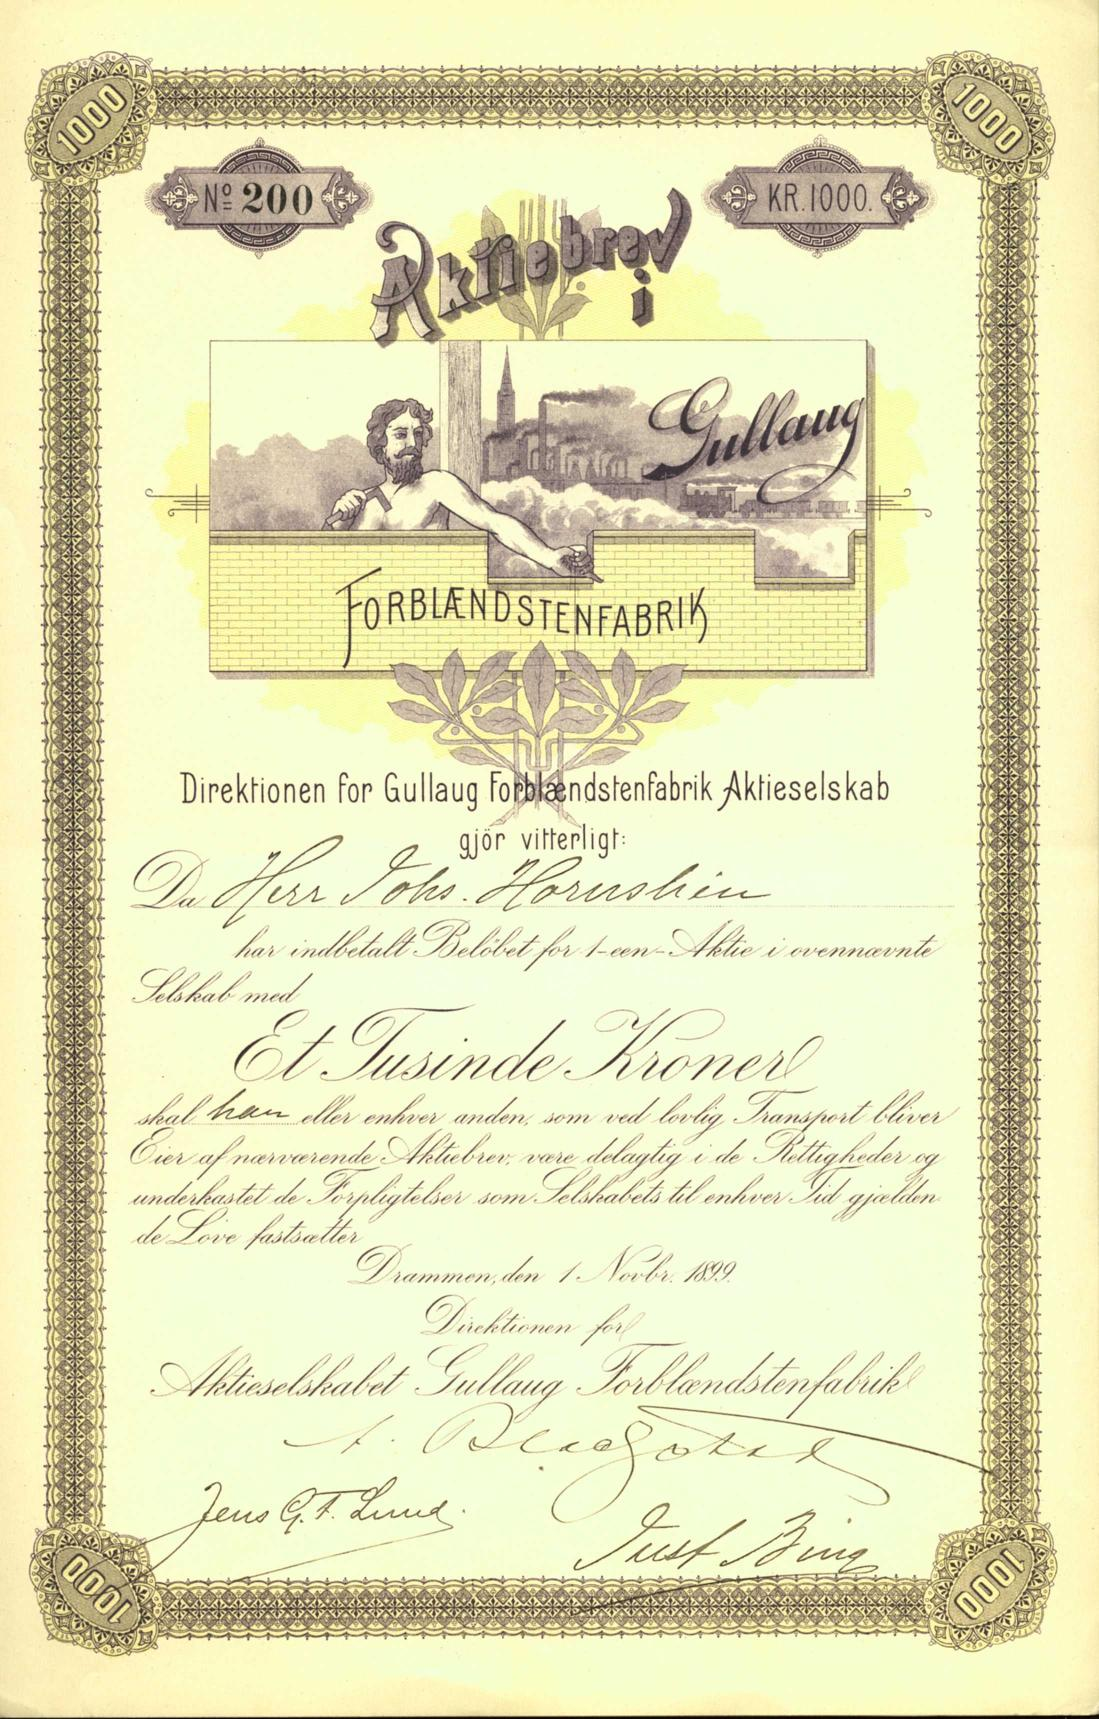 gullaug-forblandstenfabrik_1899_1000